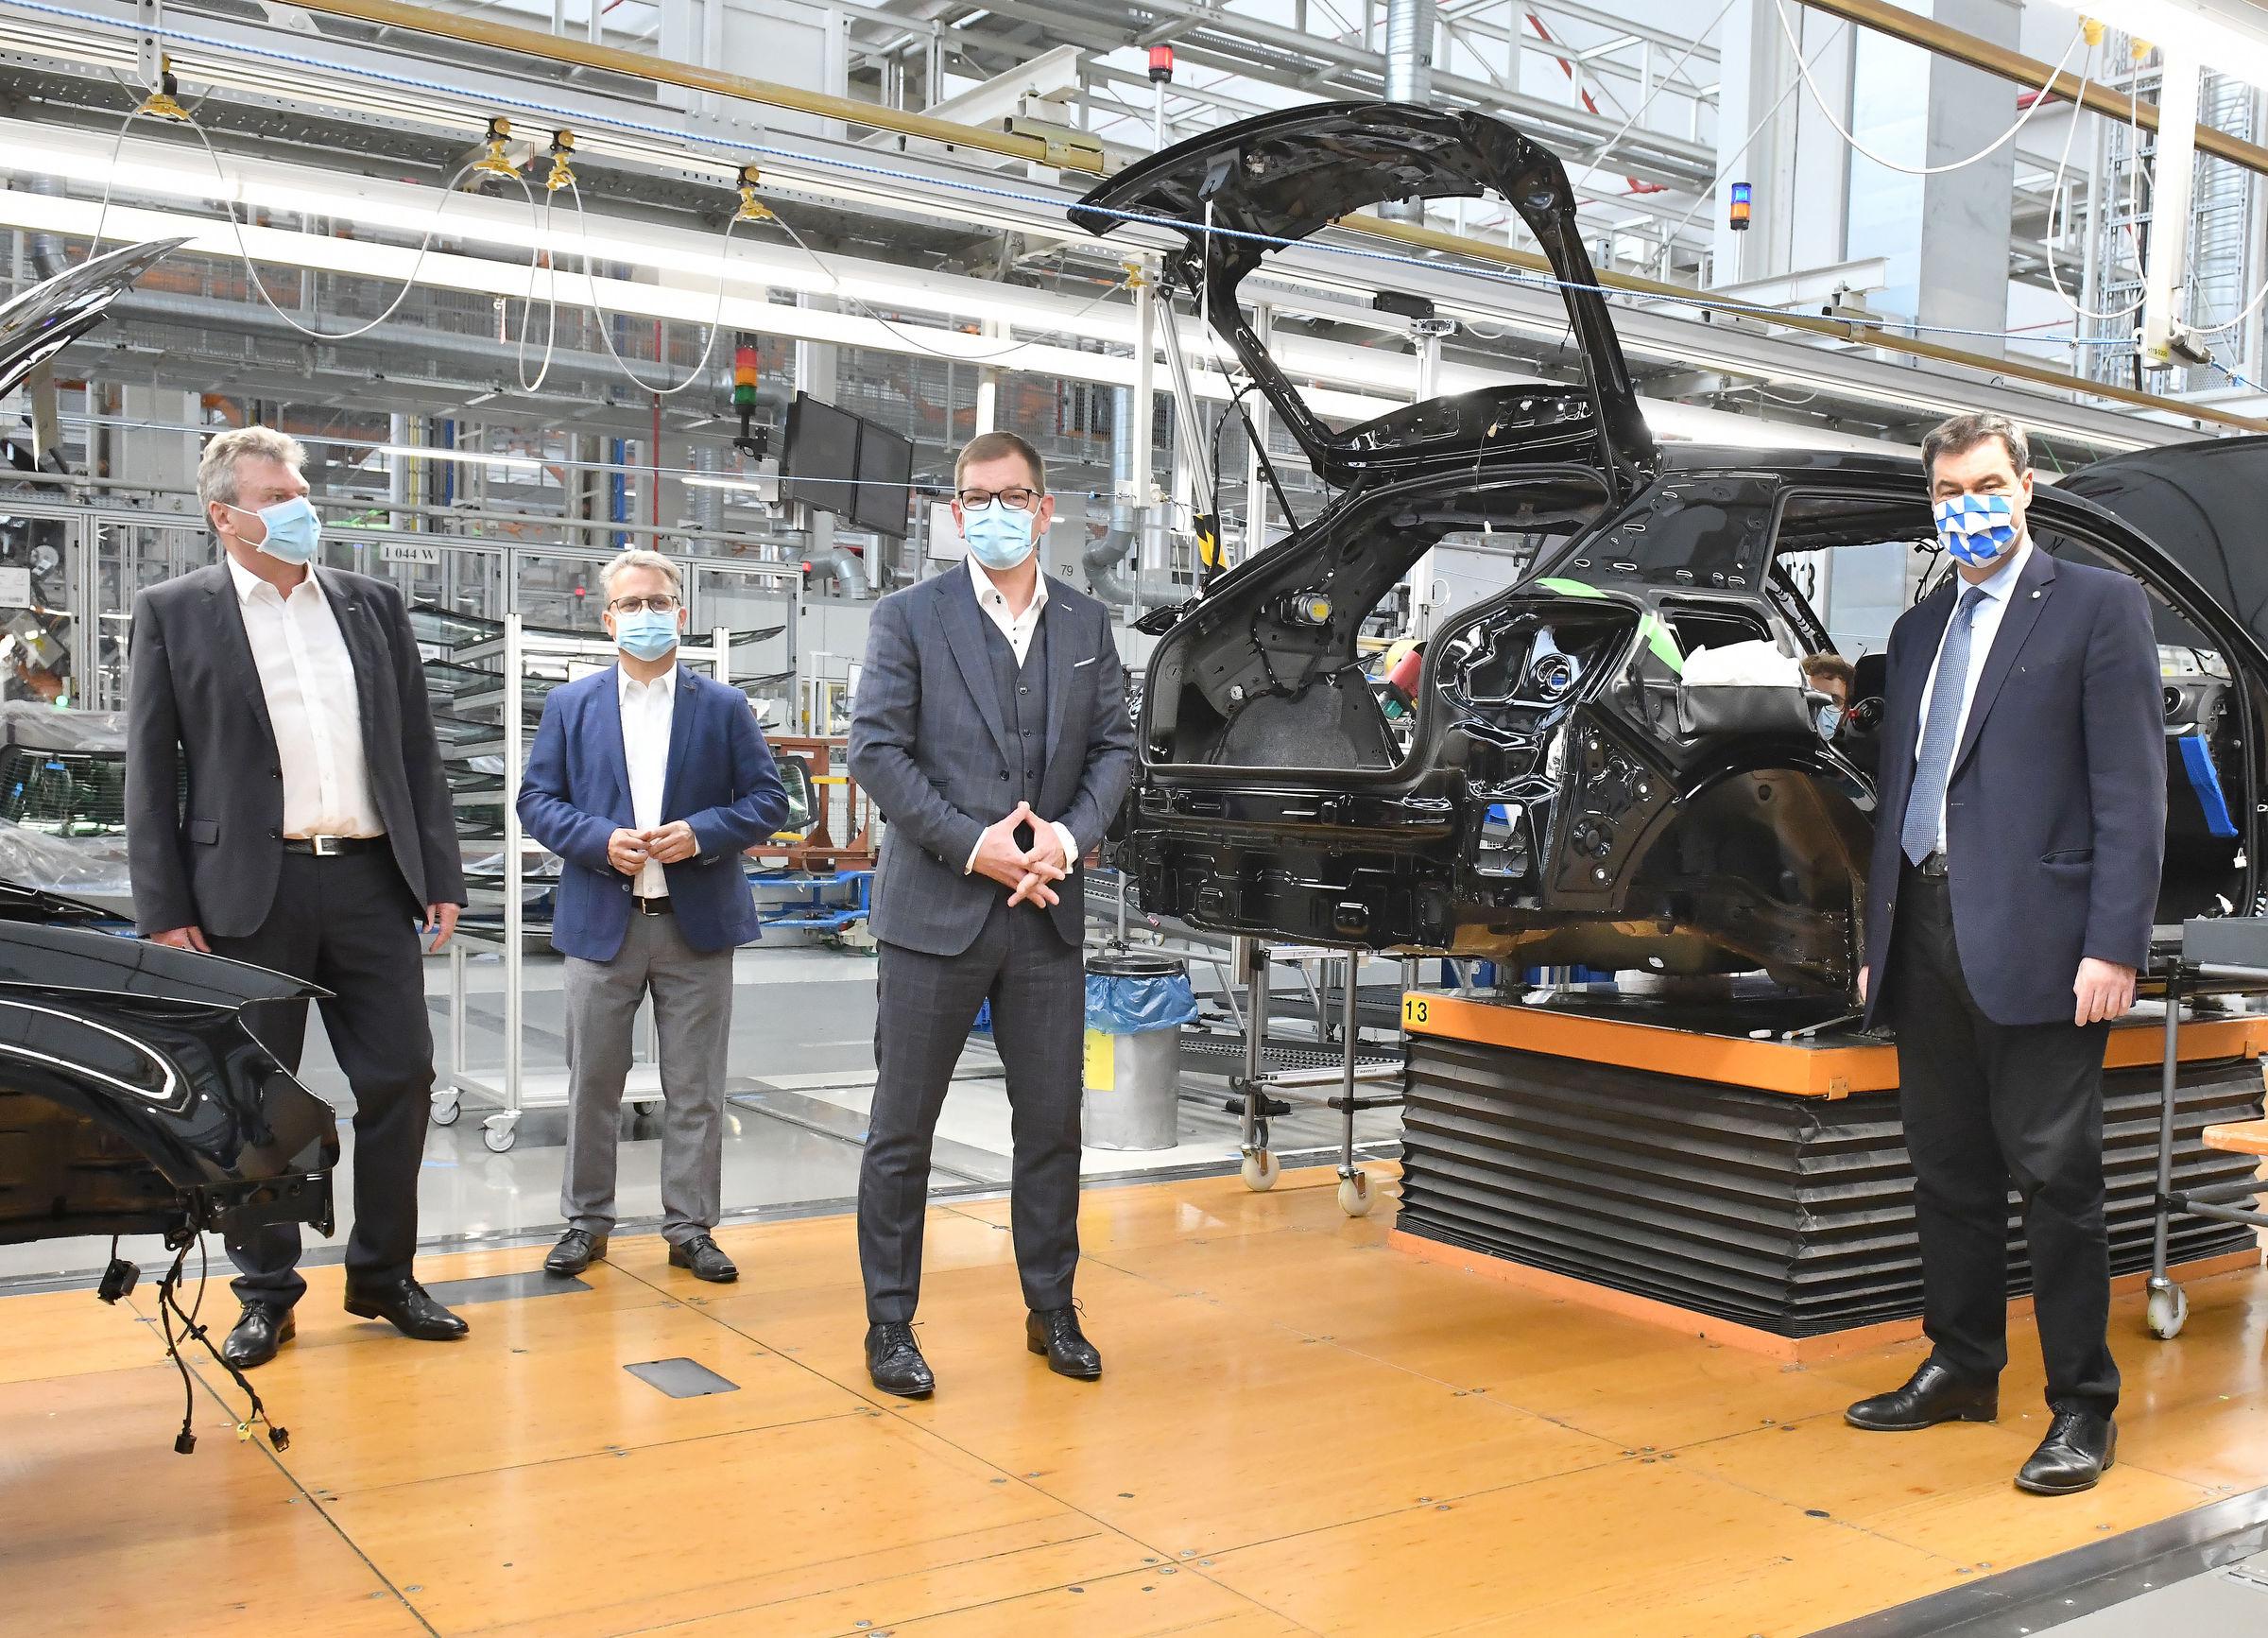 Markus Söder Visits Audi: Bavaria's Minister President Impressed with Protective Measures - Image 1